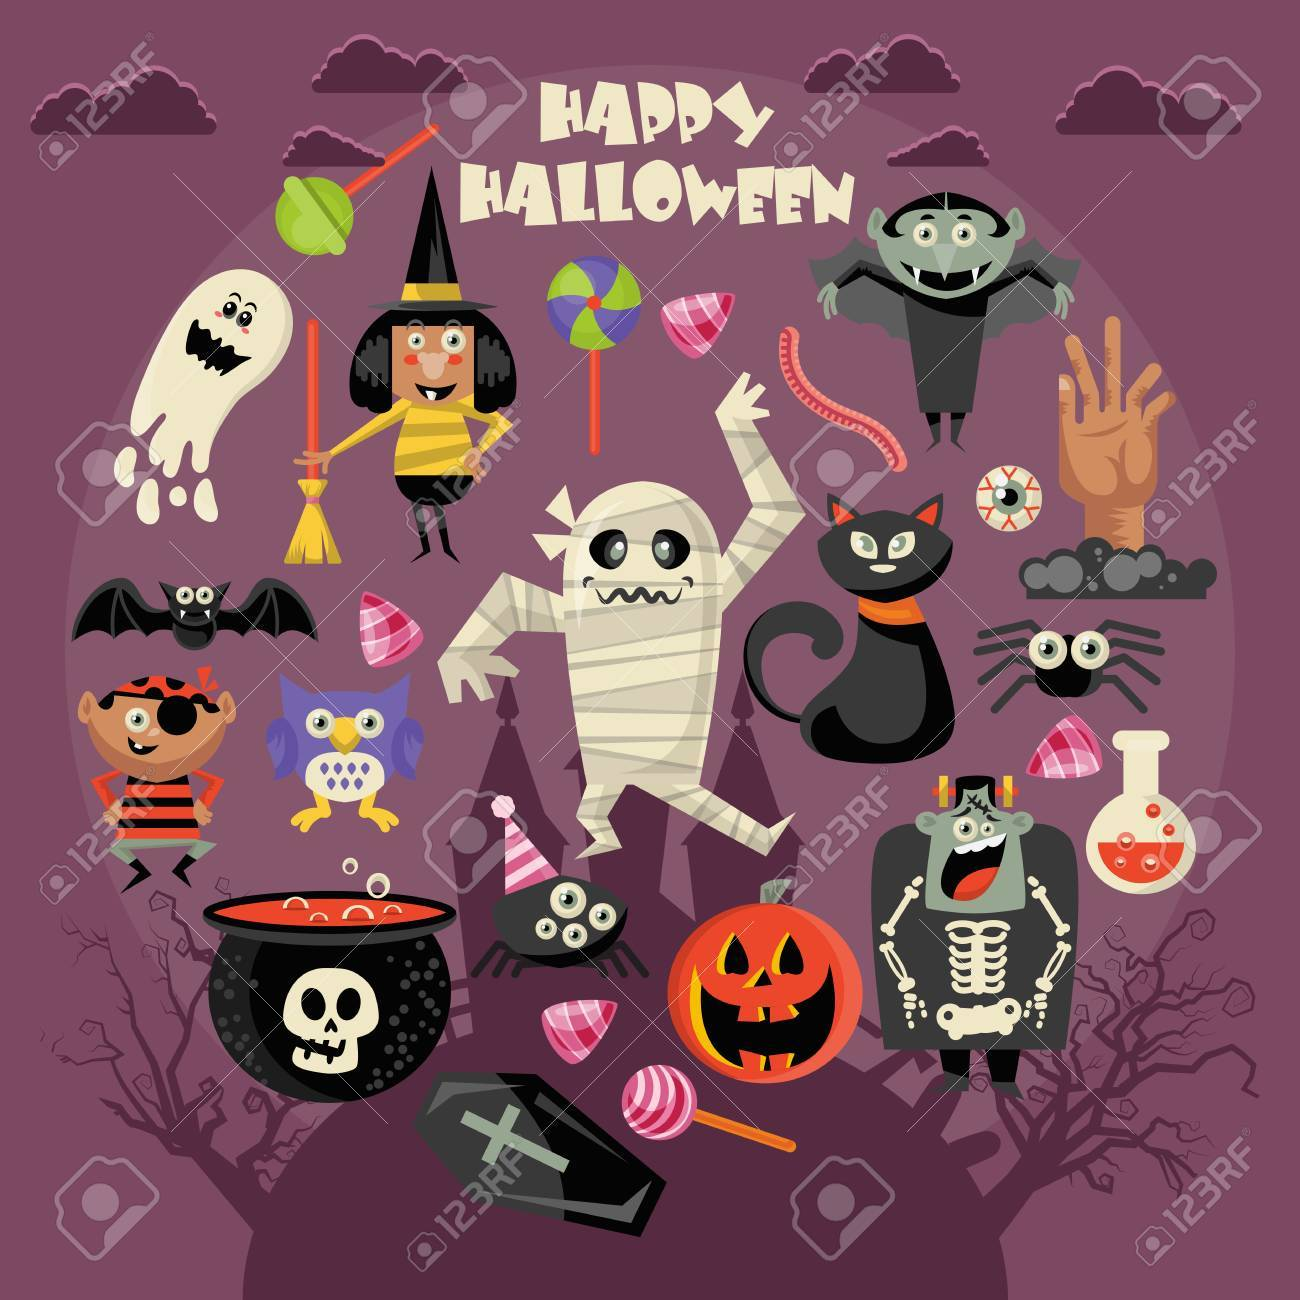 Happy Halloween greeting card illustration. - 85715145